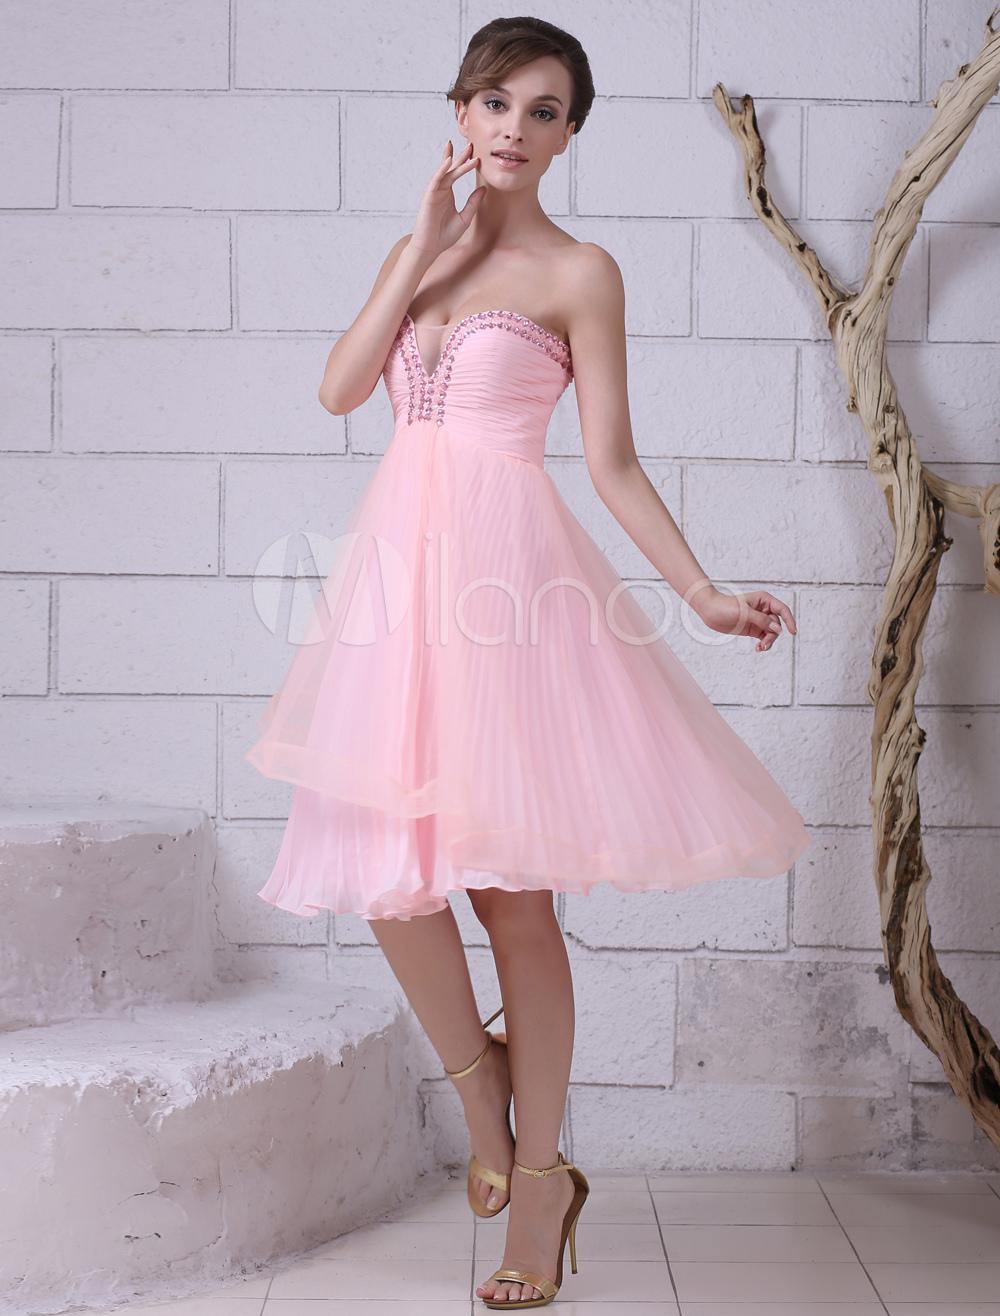 Pink Sweetheart Neck Sleeveless Pleated A-line Prom Dress Milanoo (Wedding Prom Dresses) photo